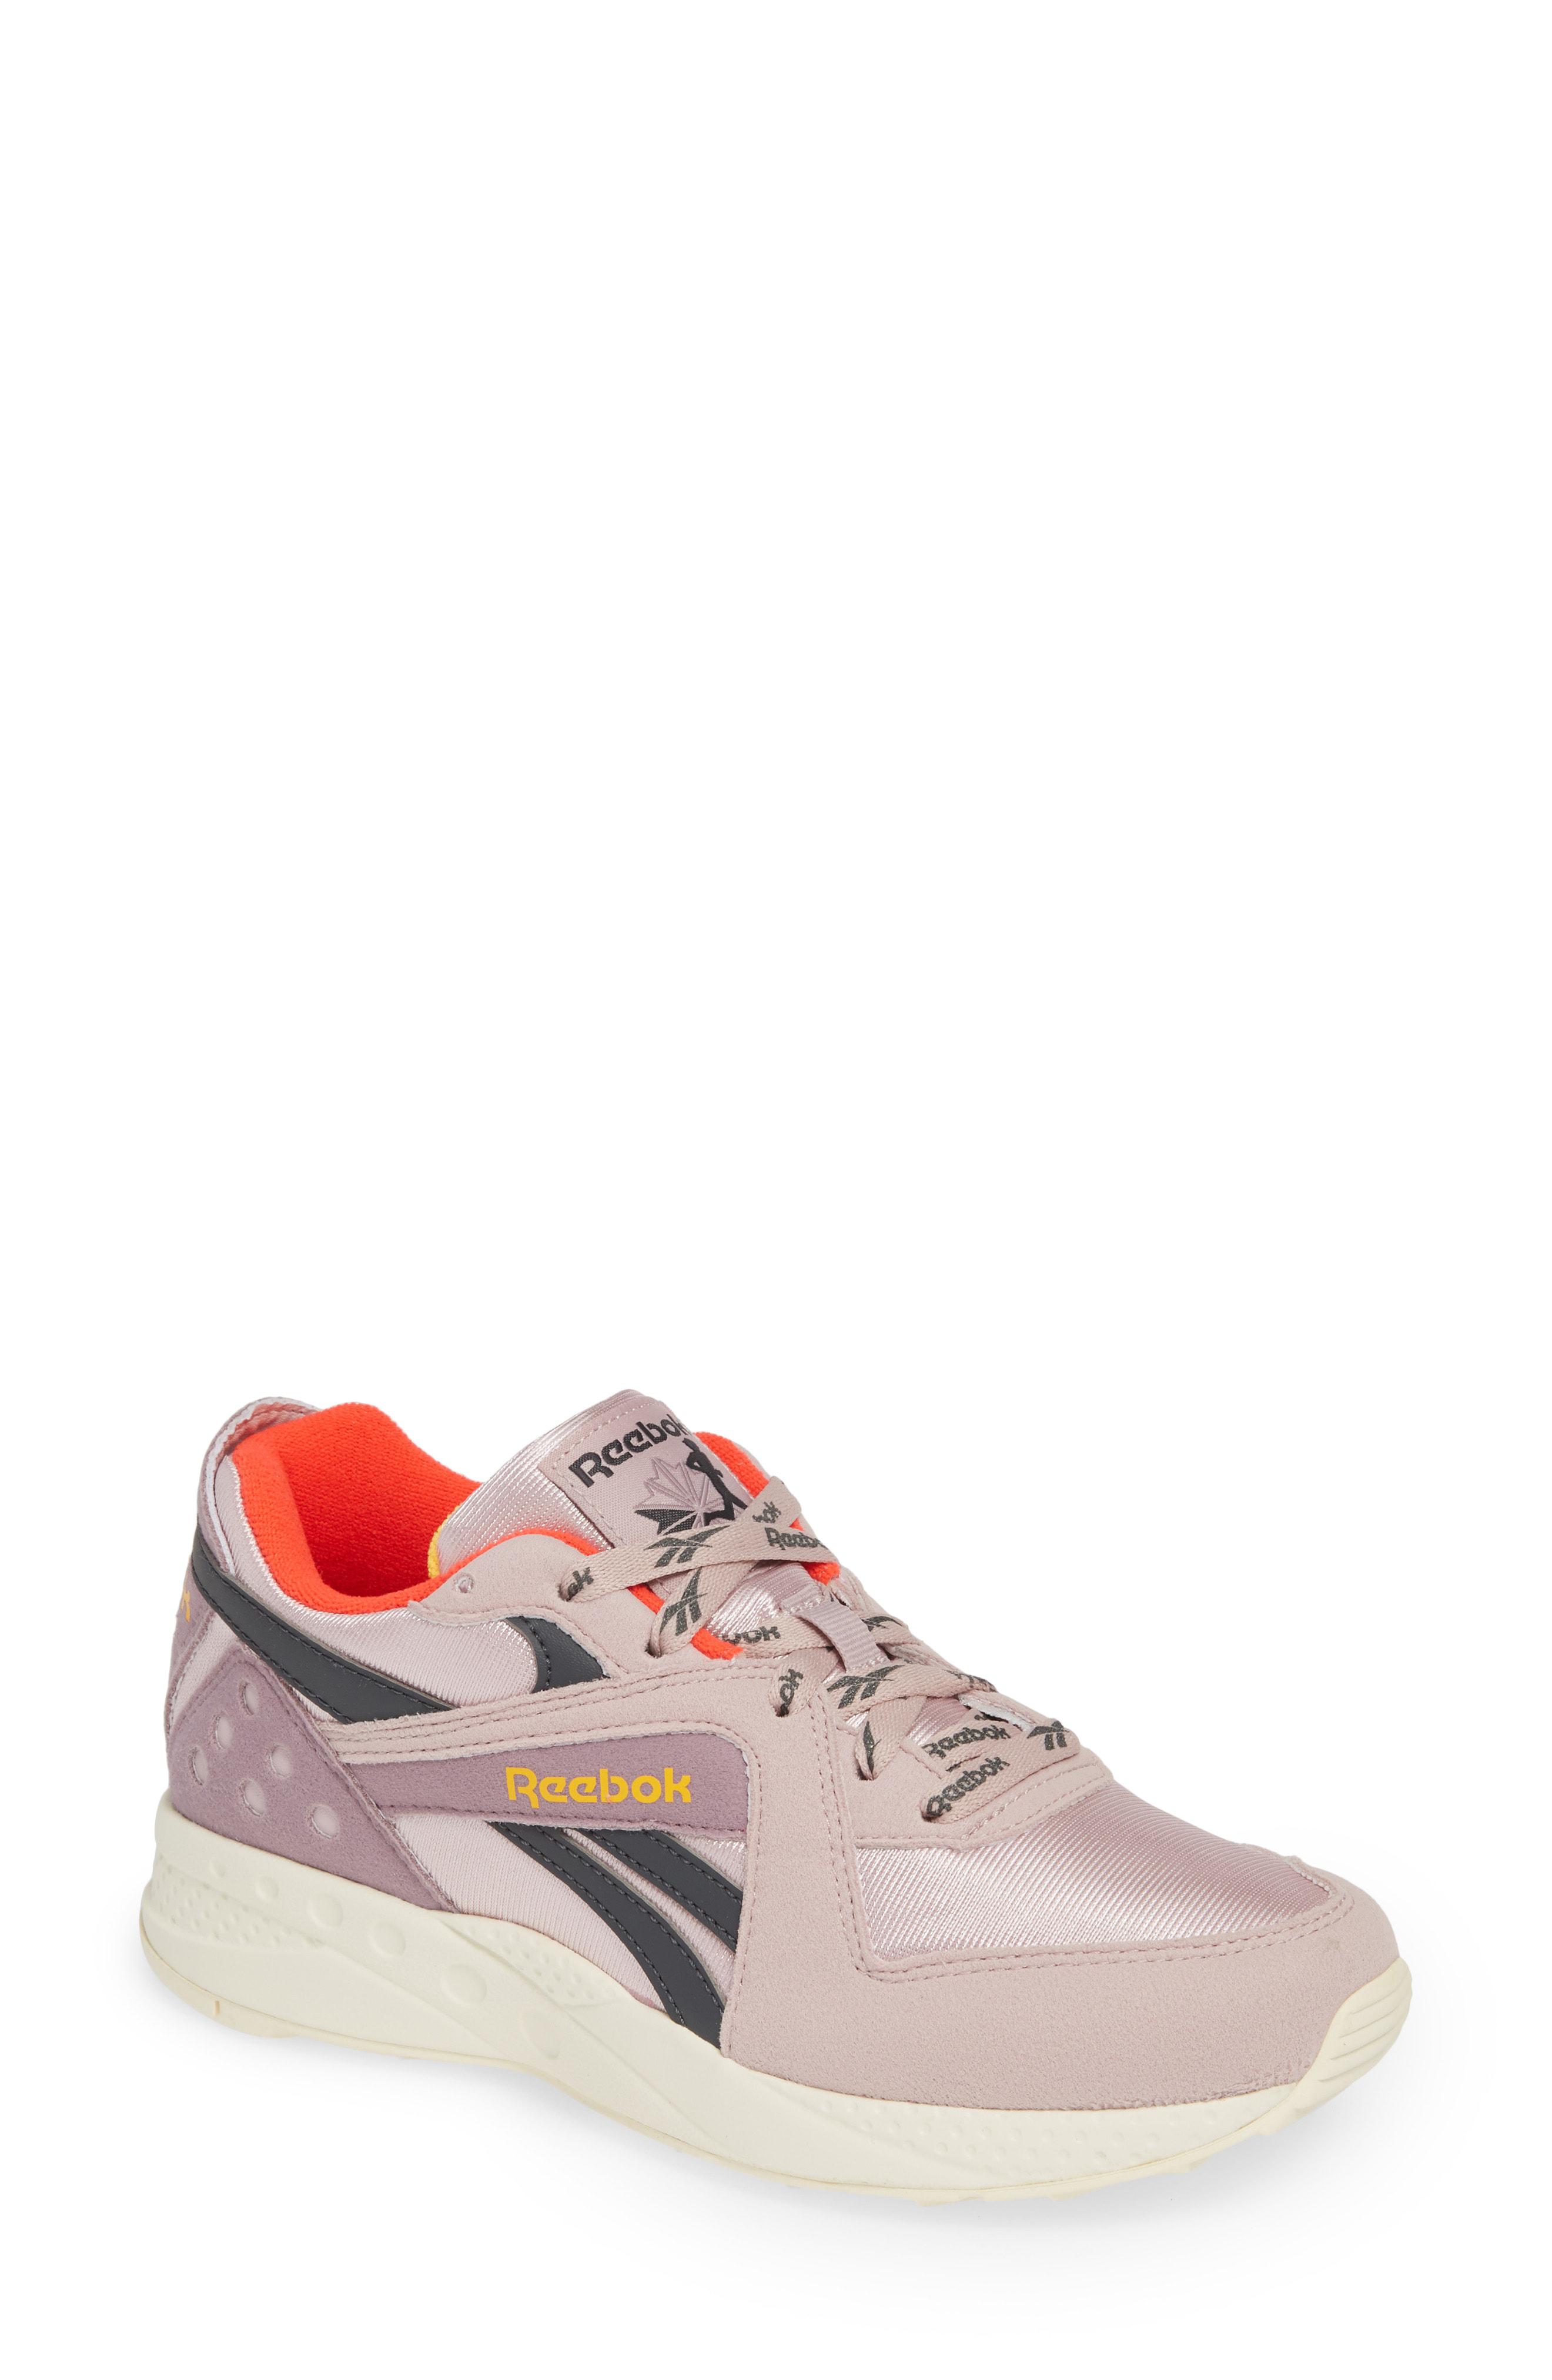 c0be7900848 Reebok Pyro Sneaker In Ashen Lilac  Lilac Fog  Grey